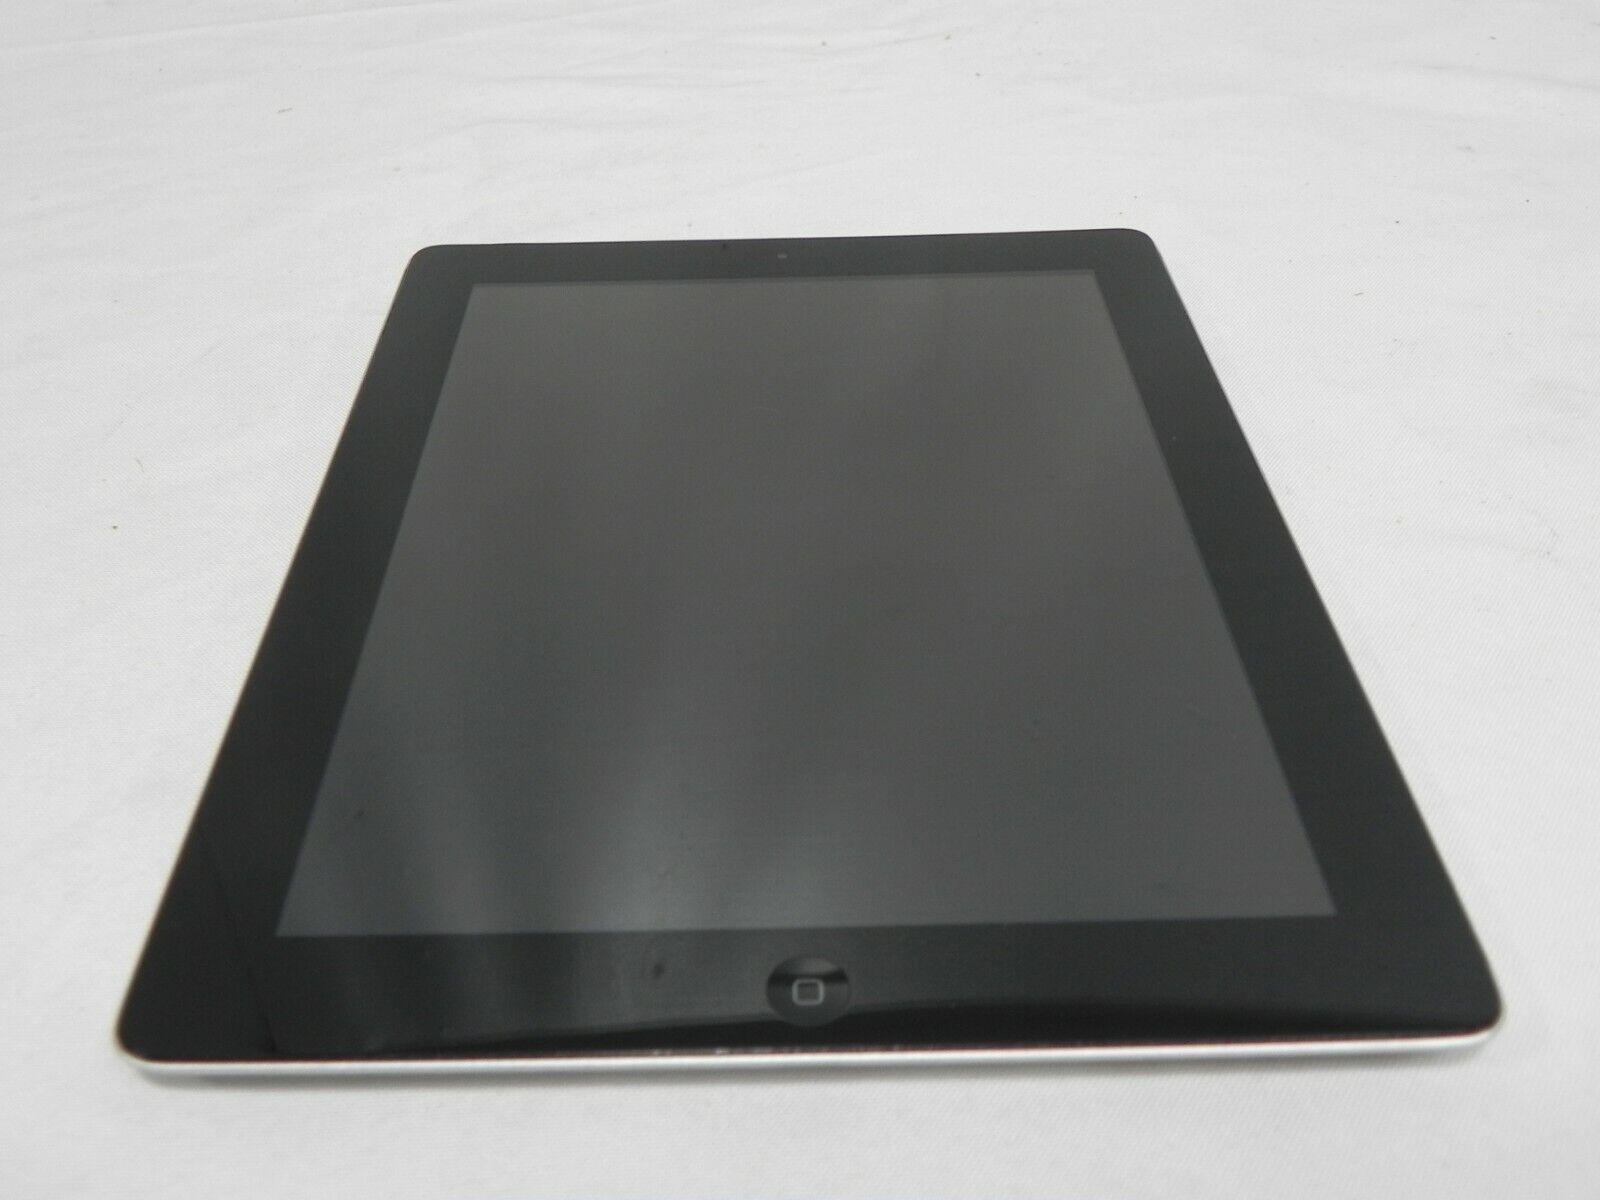 Apple iPad 4th Gen. 64GB, Wi-Fi + Cellular (MD524LL/A), A1460, 9.7in - Black